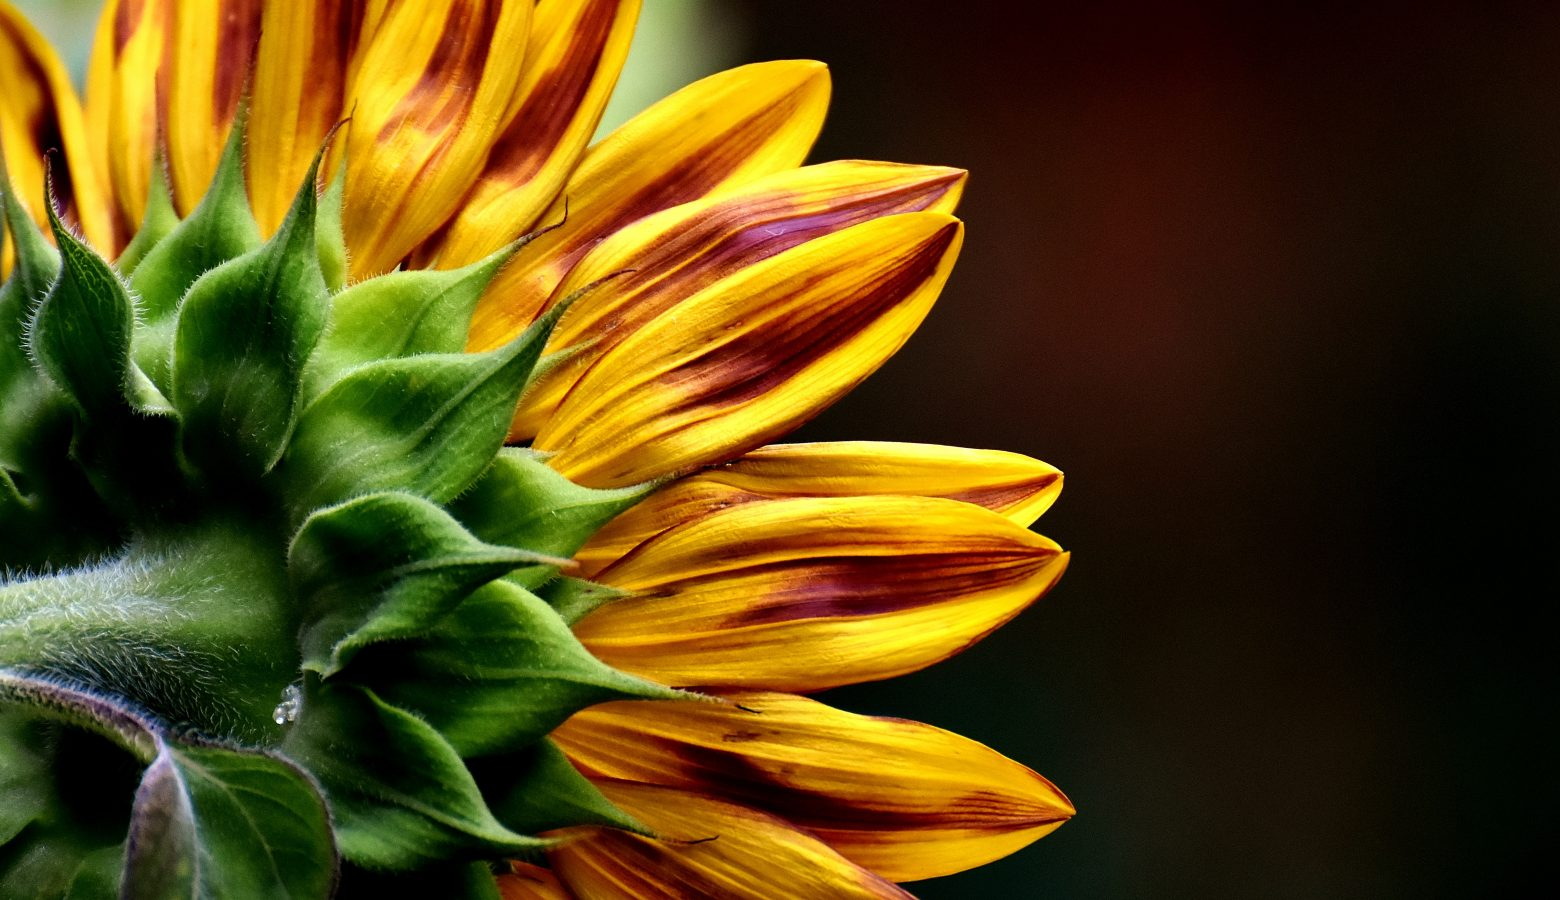 sun-flower-2911089